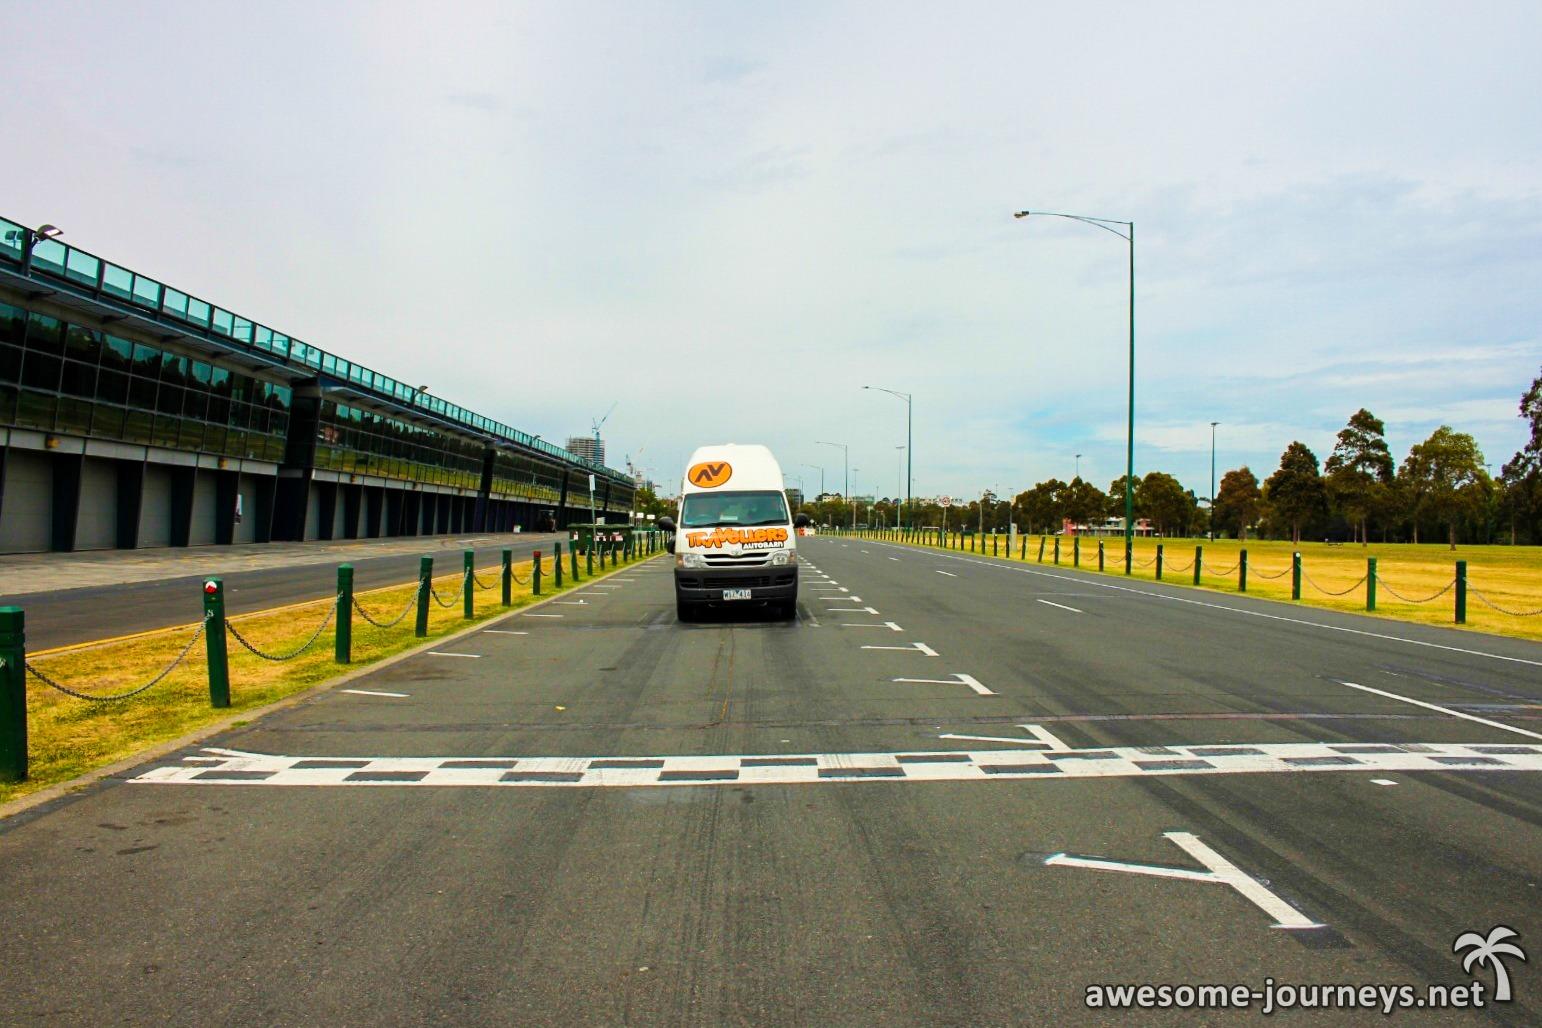 Formel 1 Strecke in Melbourne